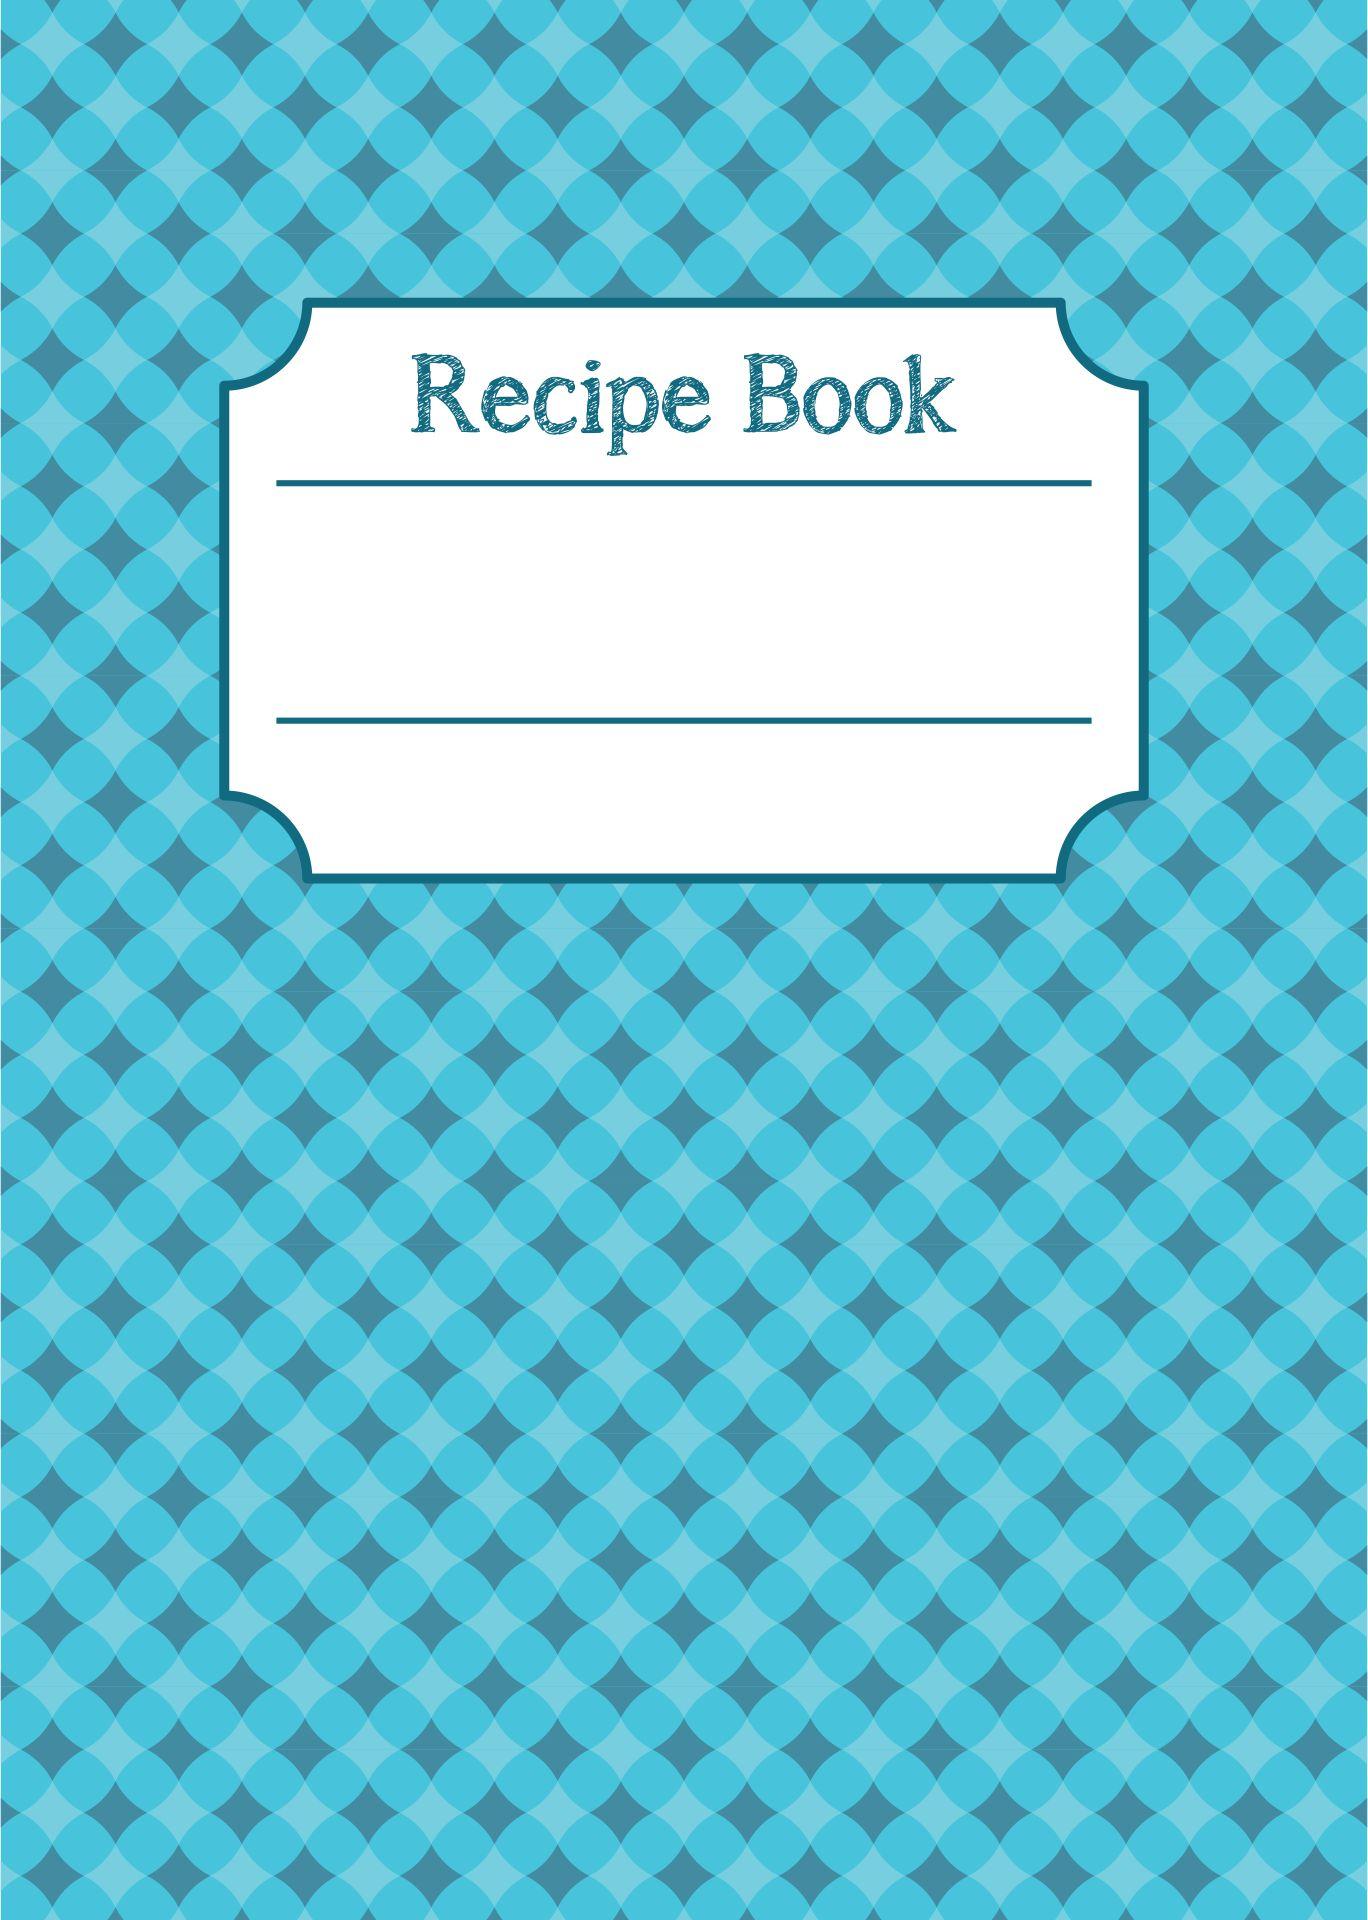 Printable Cookbook Cover Design Ideas